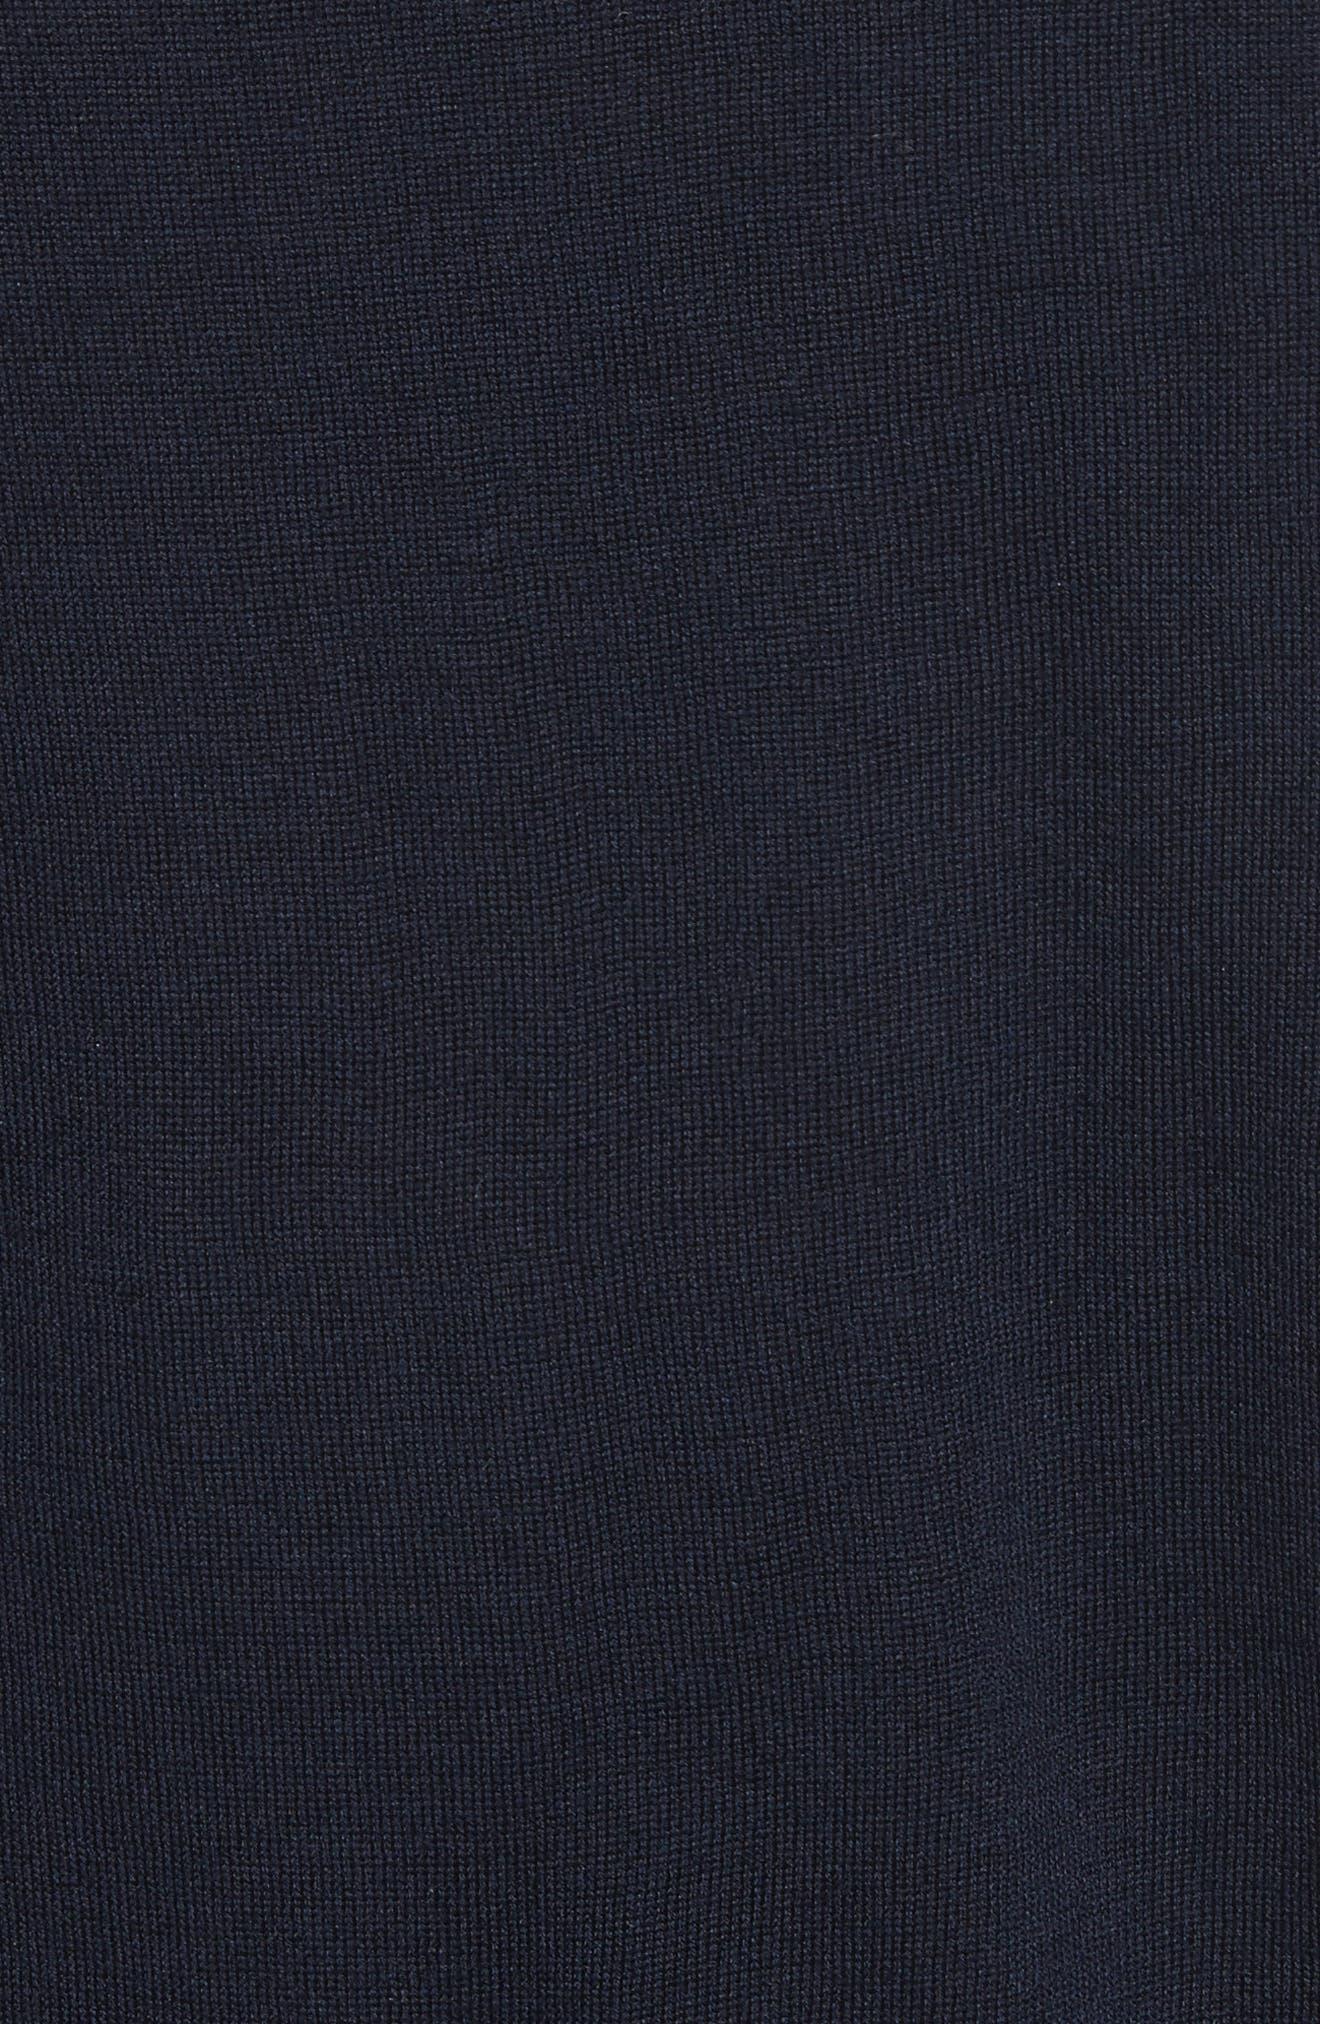 Sigfred Merino Wool & Silk Crewneck Sweater,                             Alternate thumbnail 5, color,                             Dark Navy